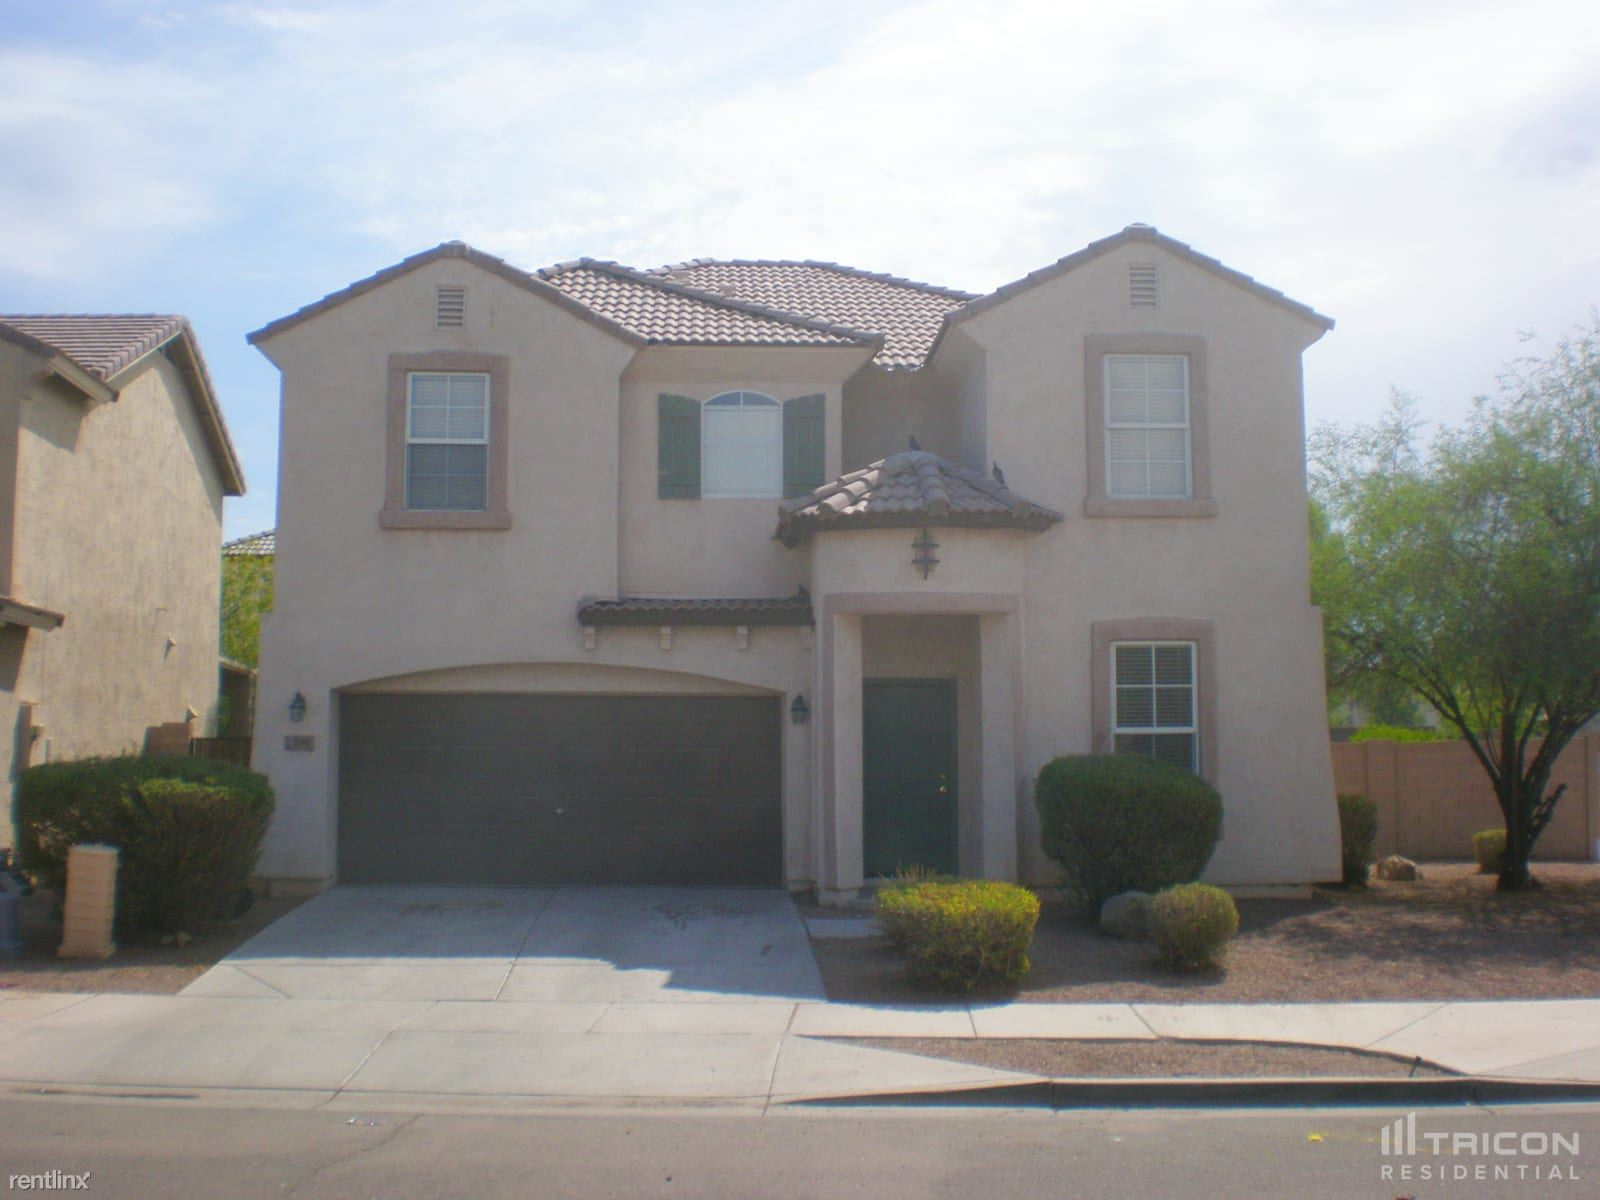 2531 S 89th Lane, Tolleson, AZ - 1,849 USD/ month